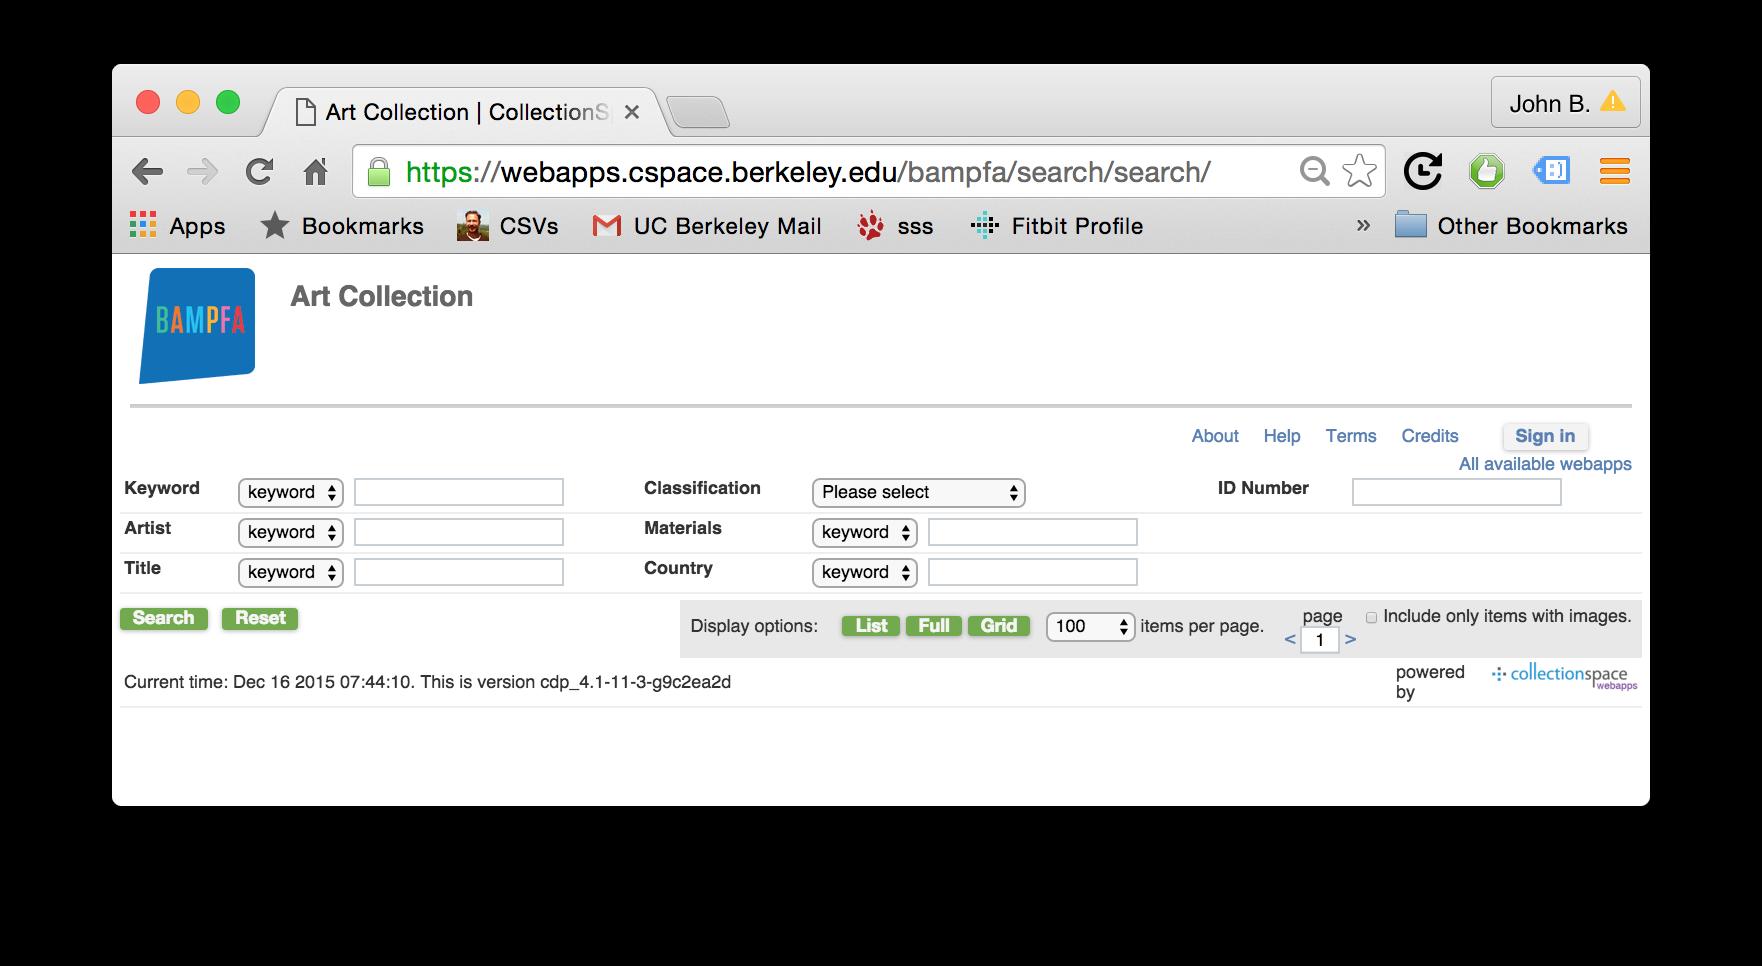 BAMPFA search portal screenshot